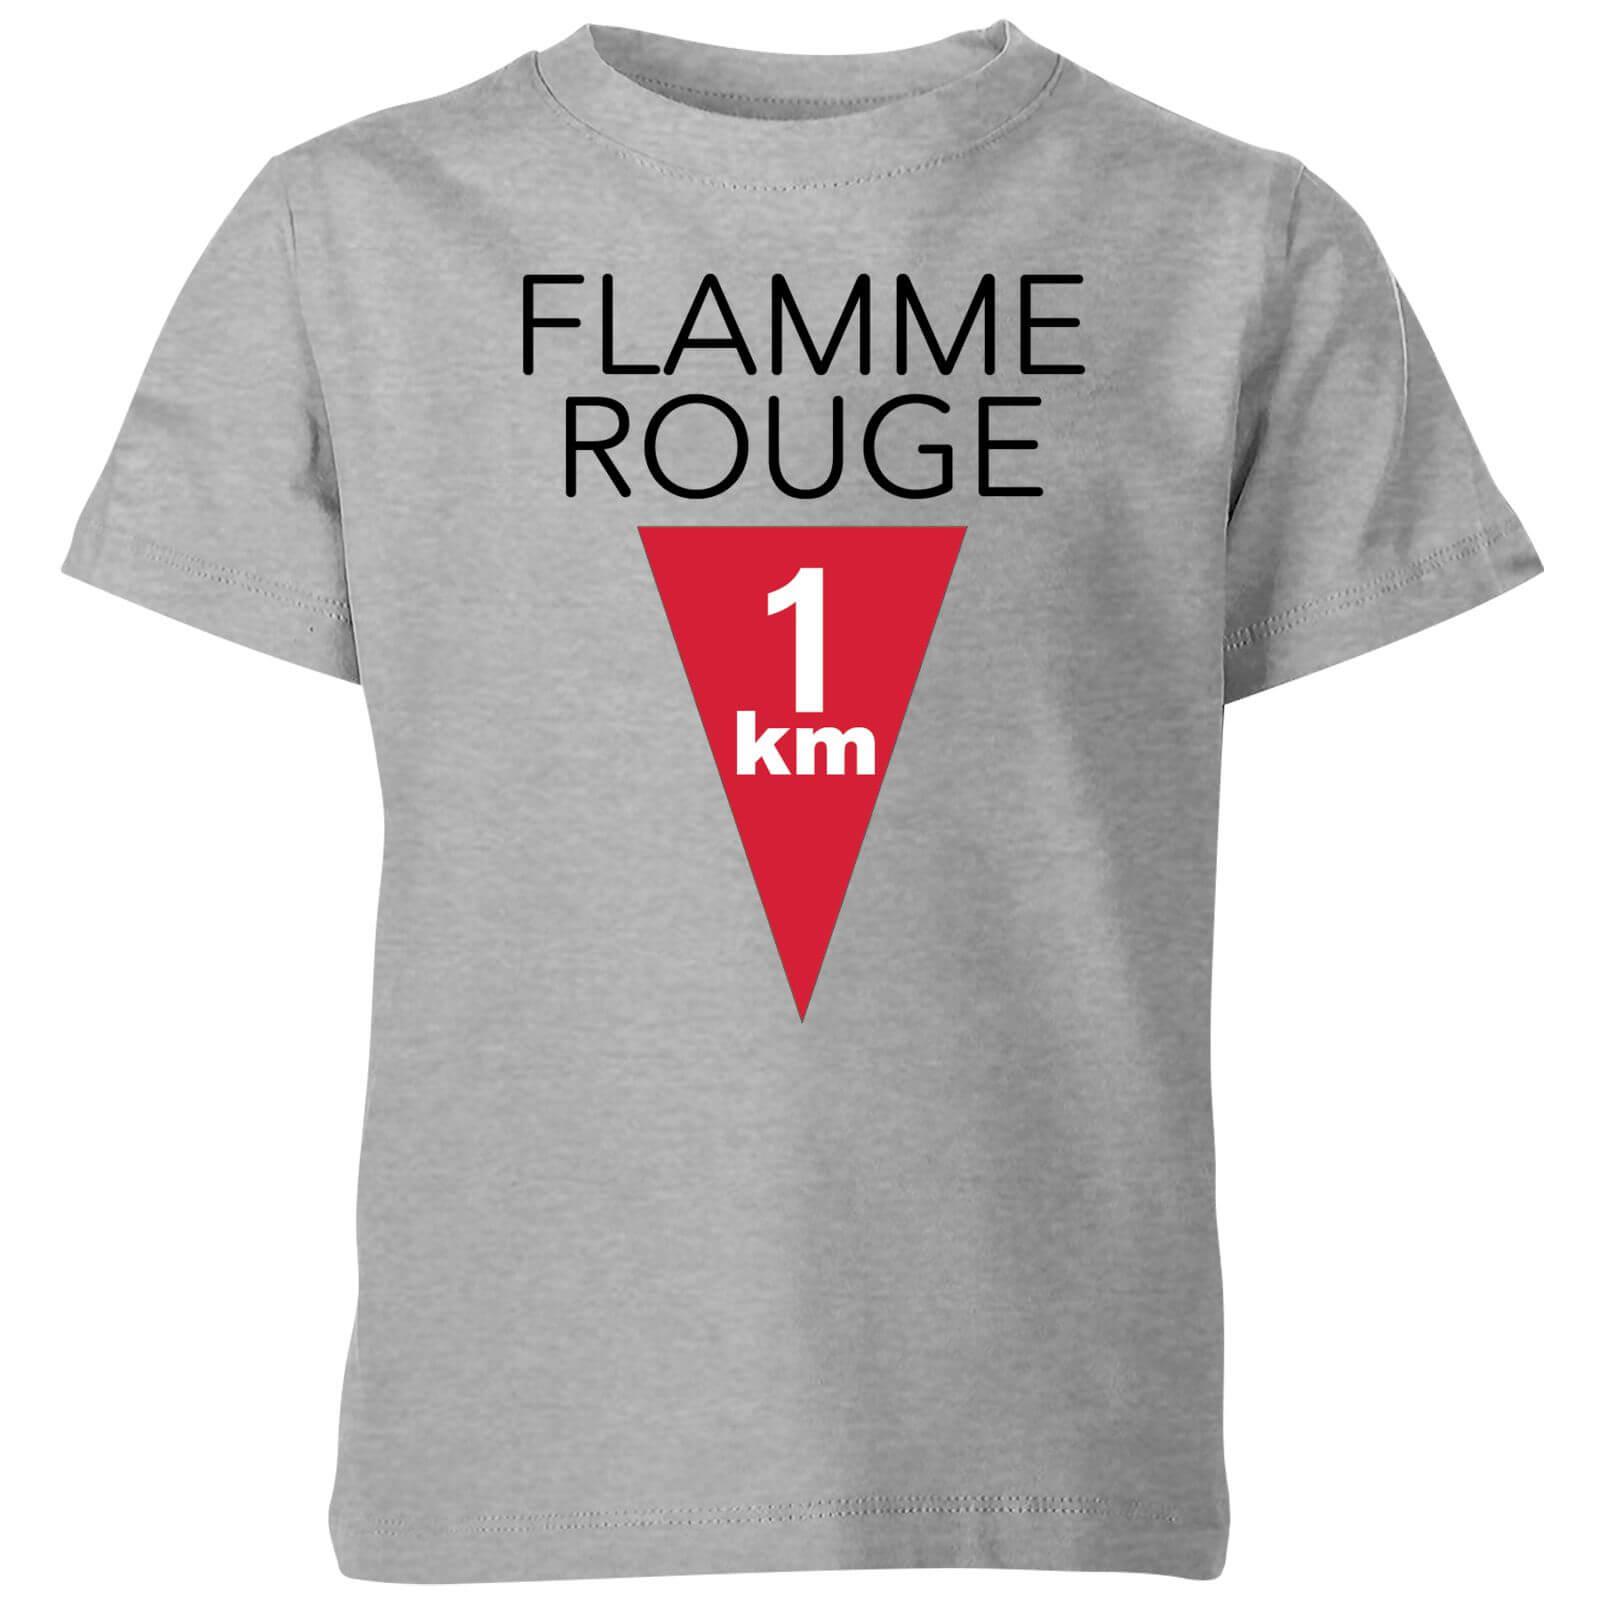 Summit Finish Flamme Rouge Kids T-shirt - Grey - 3-4 Years - Grey